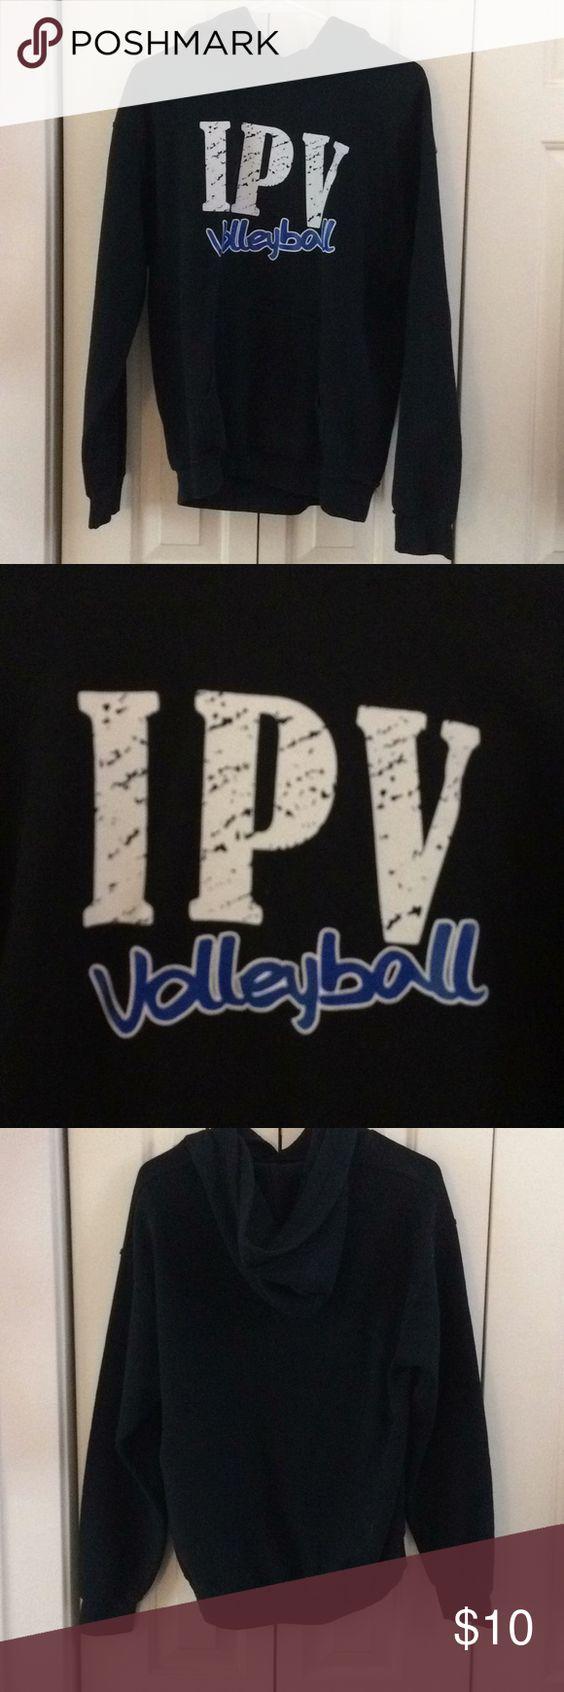 Gilden Volleyball Sweatshirt Black Sweatshirts Volleyball Sweatshirts Black Sweatshirts